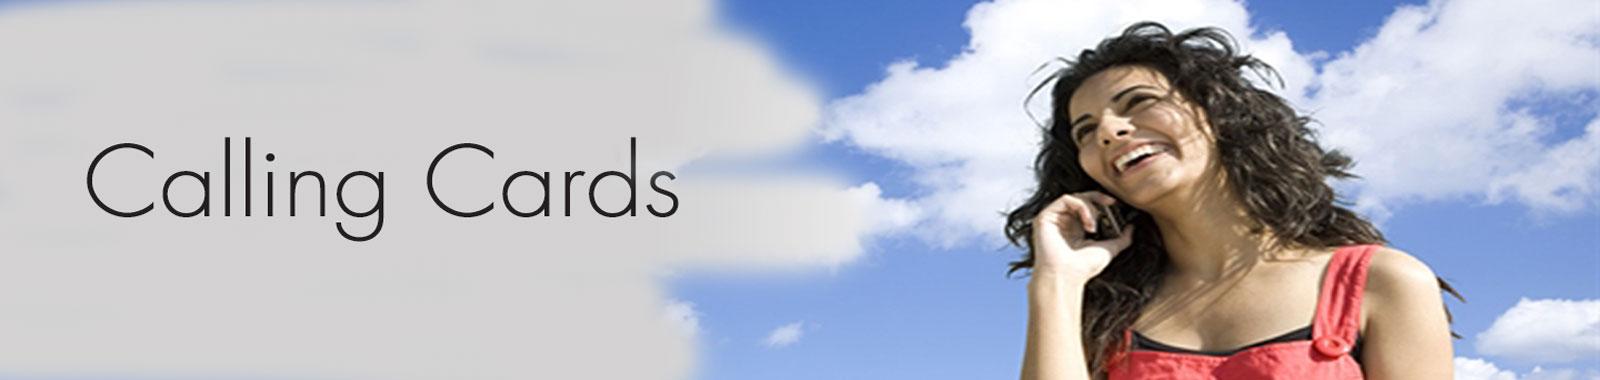 International Calling Cards Service |  La Esperanza Travels